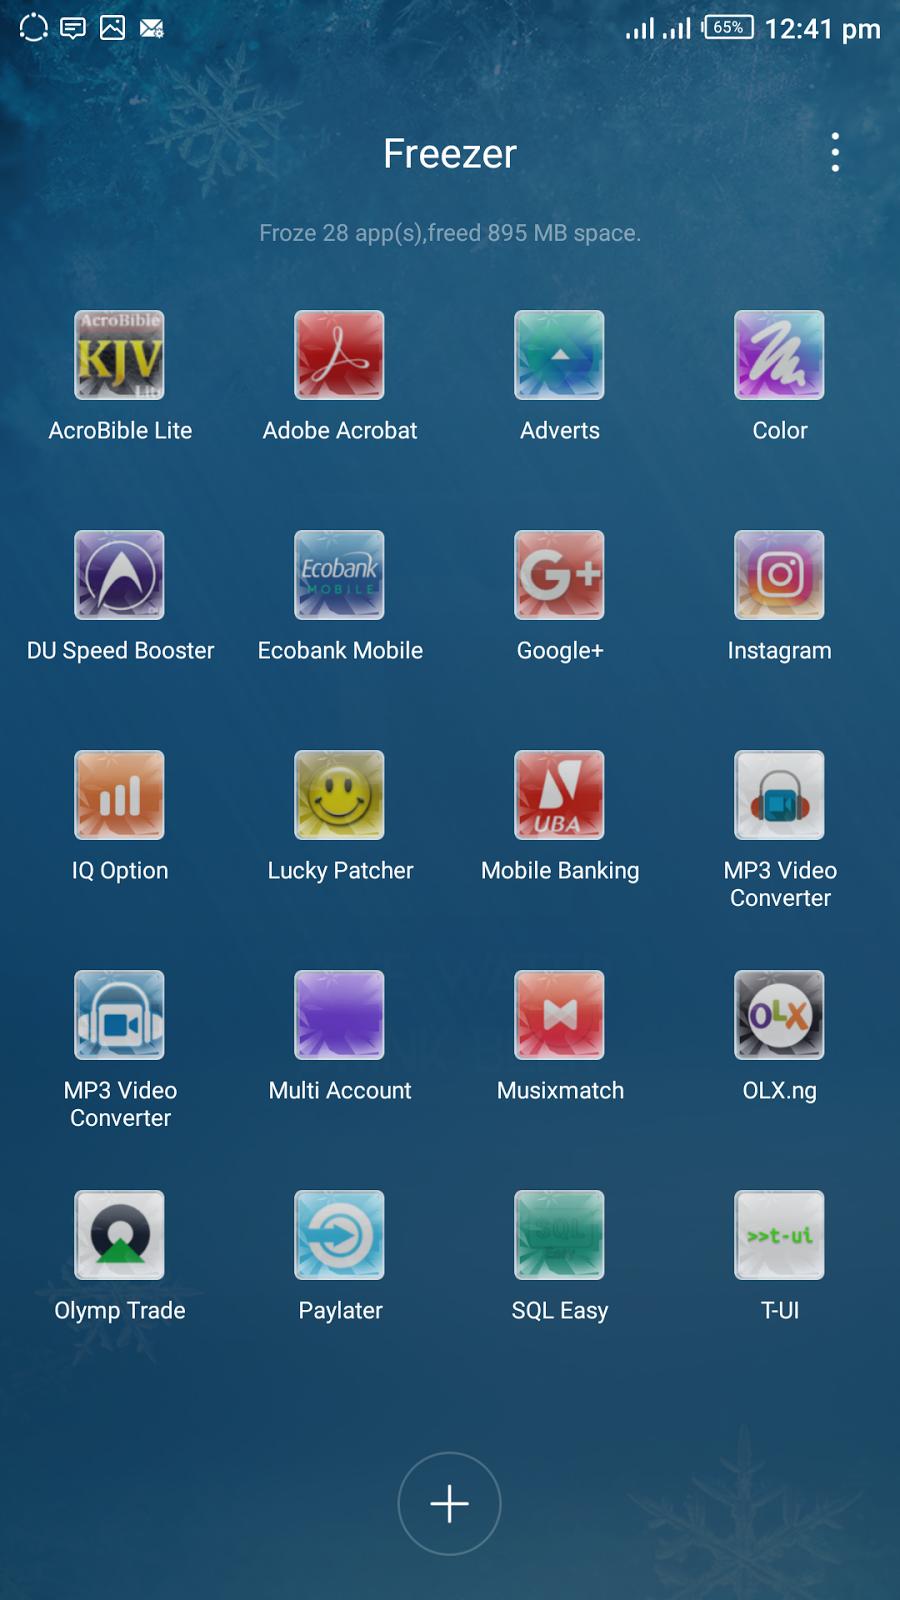 XOS app freezer main menu